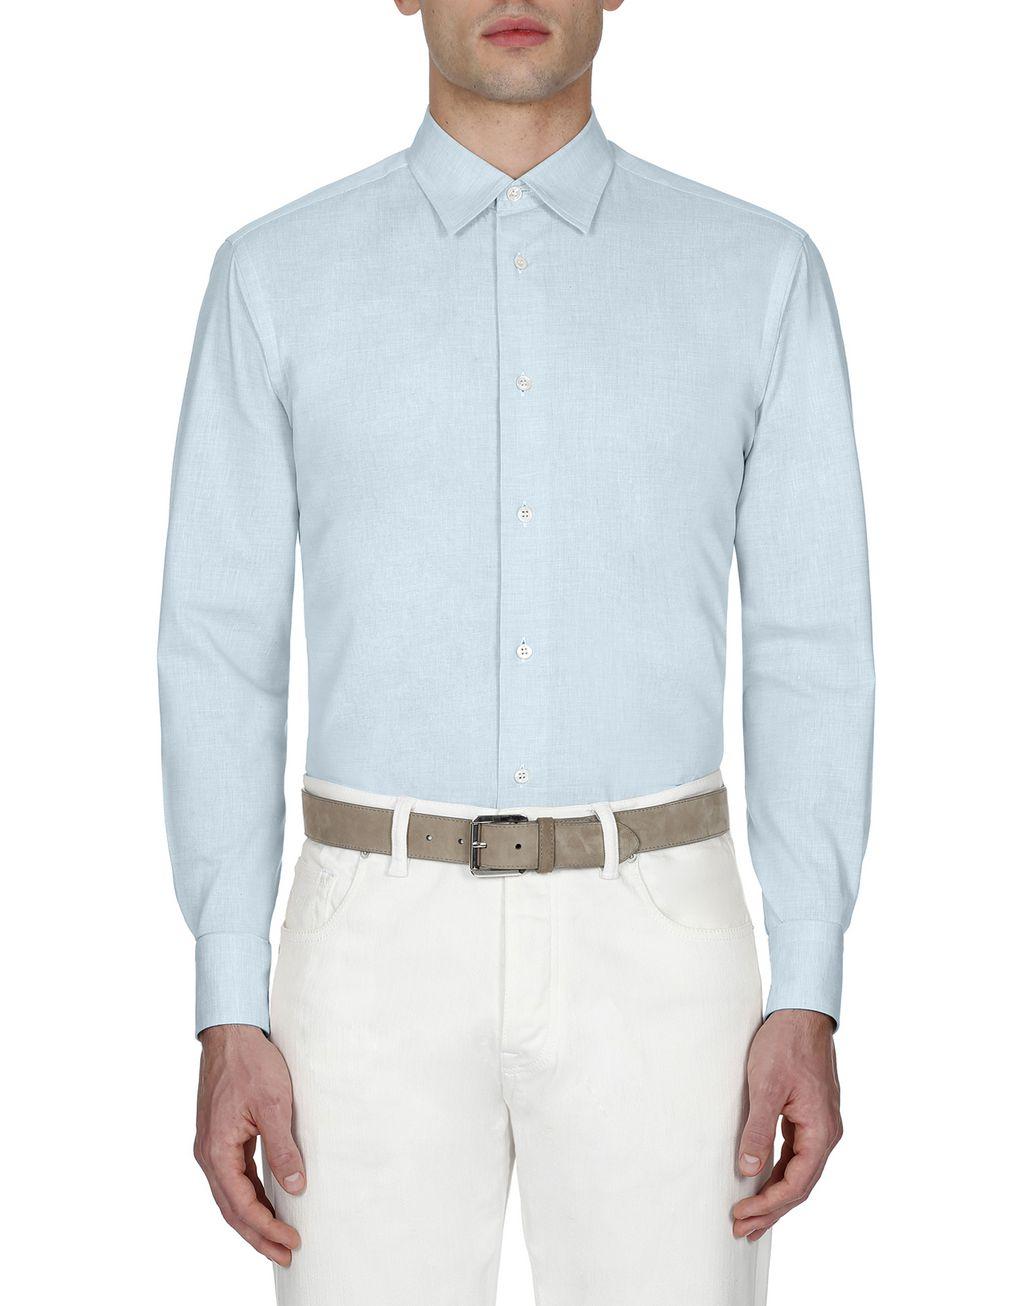 BRIONI Light Blue Cotton Shirt Leisure shirt Man r